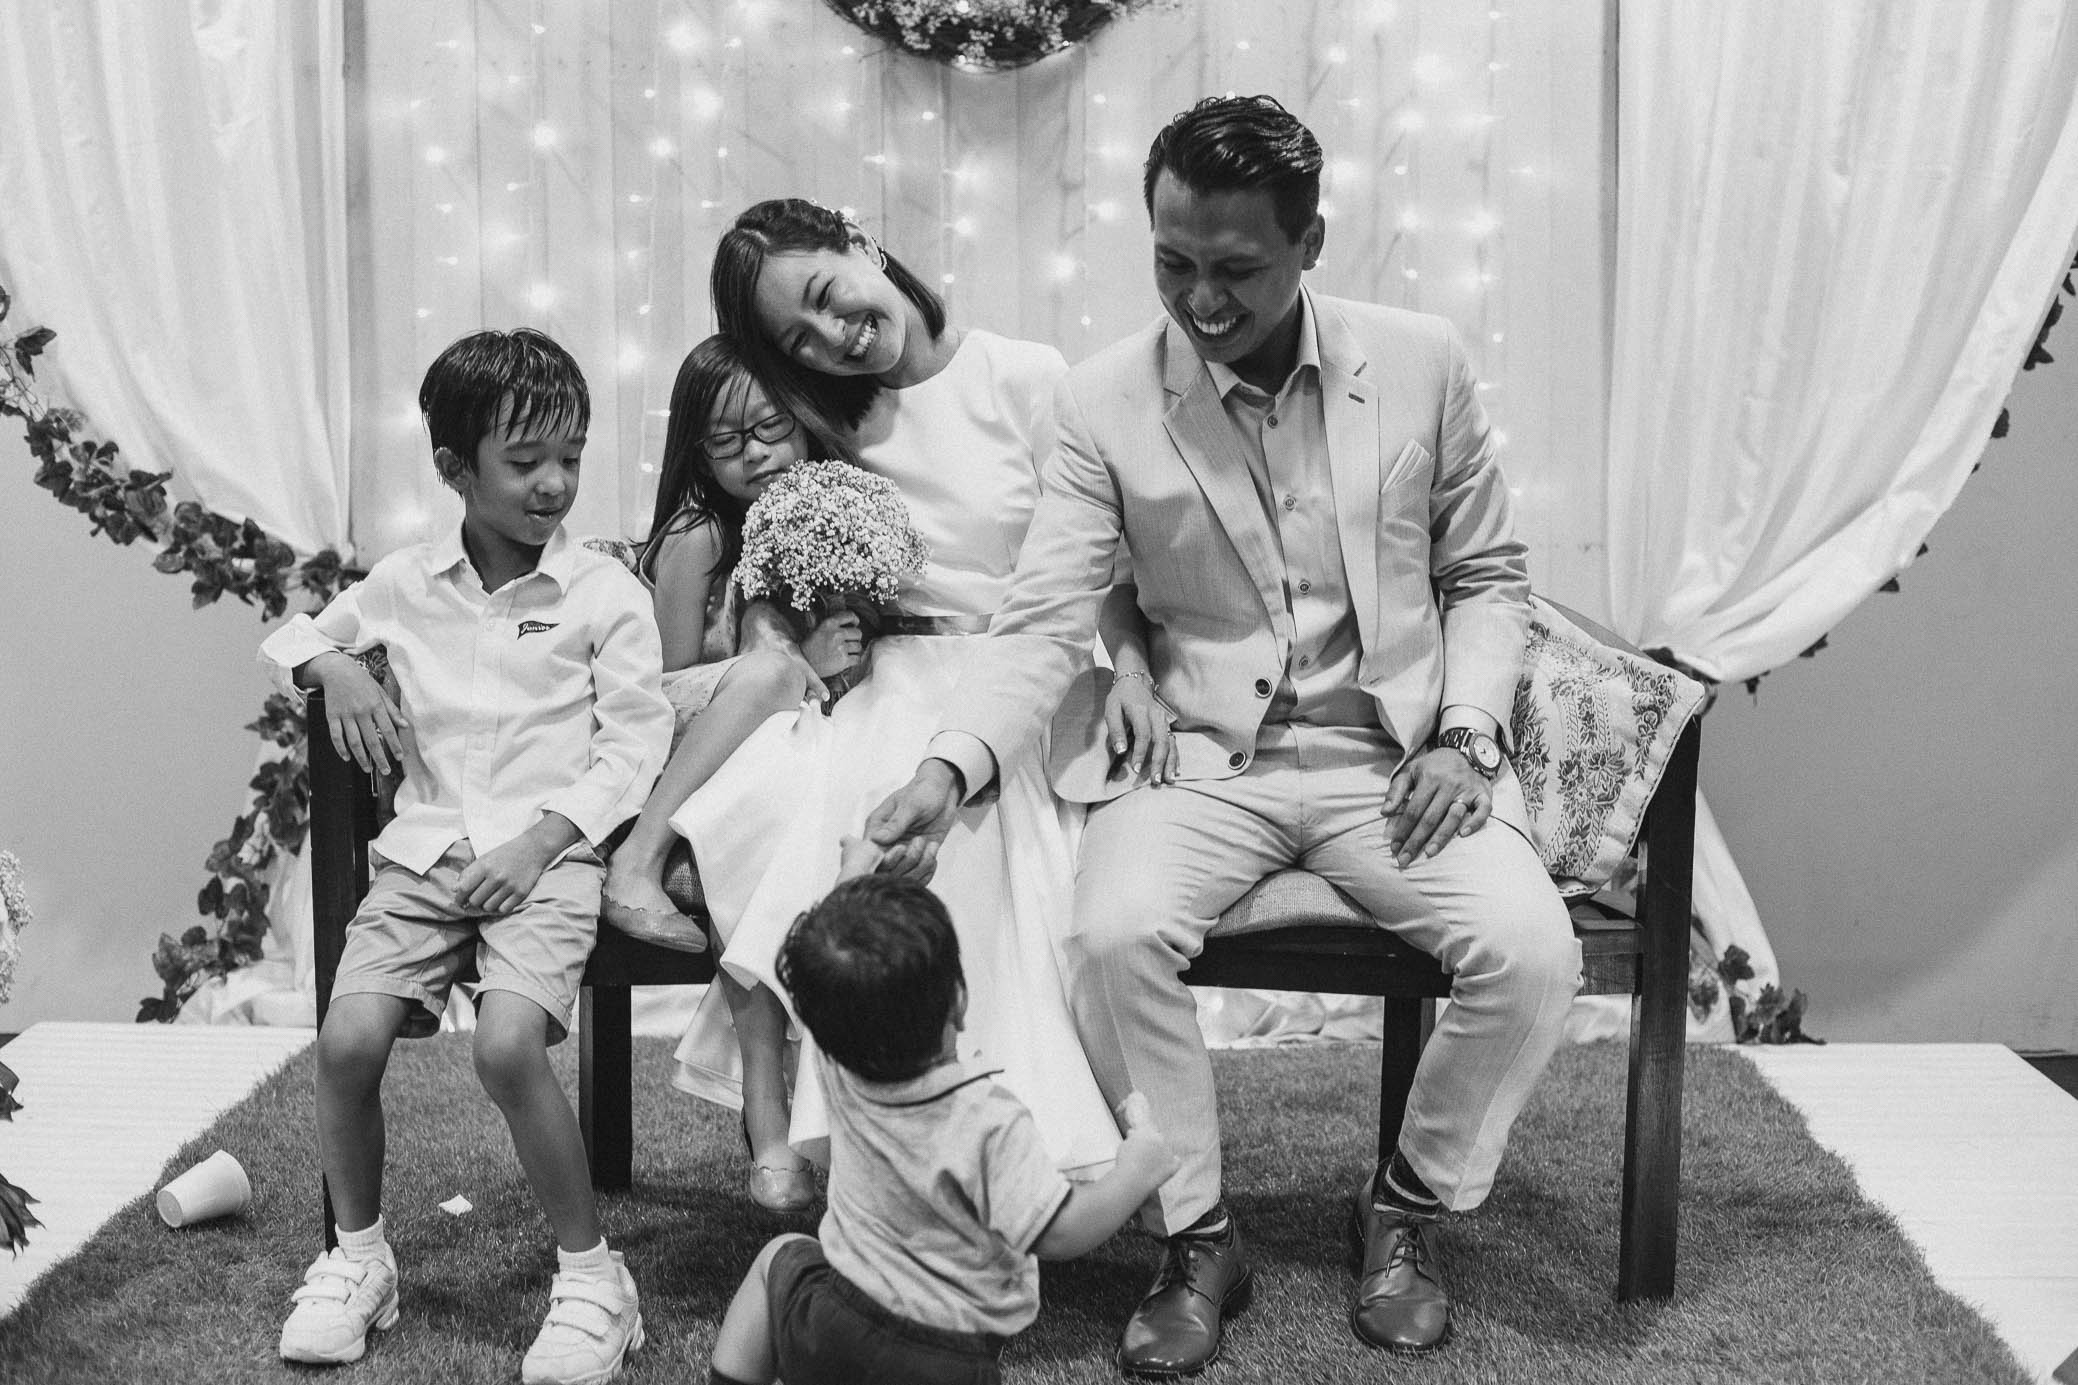 singapore-wedding-photographer-malay-indian-pre-wedding-travel-wmt-2015-alif-ethel-64.jpg